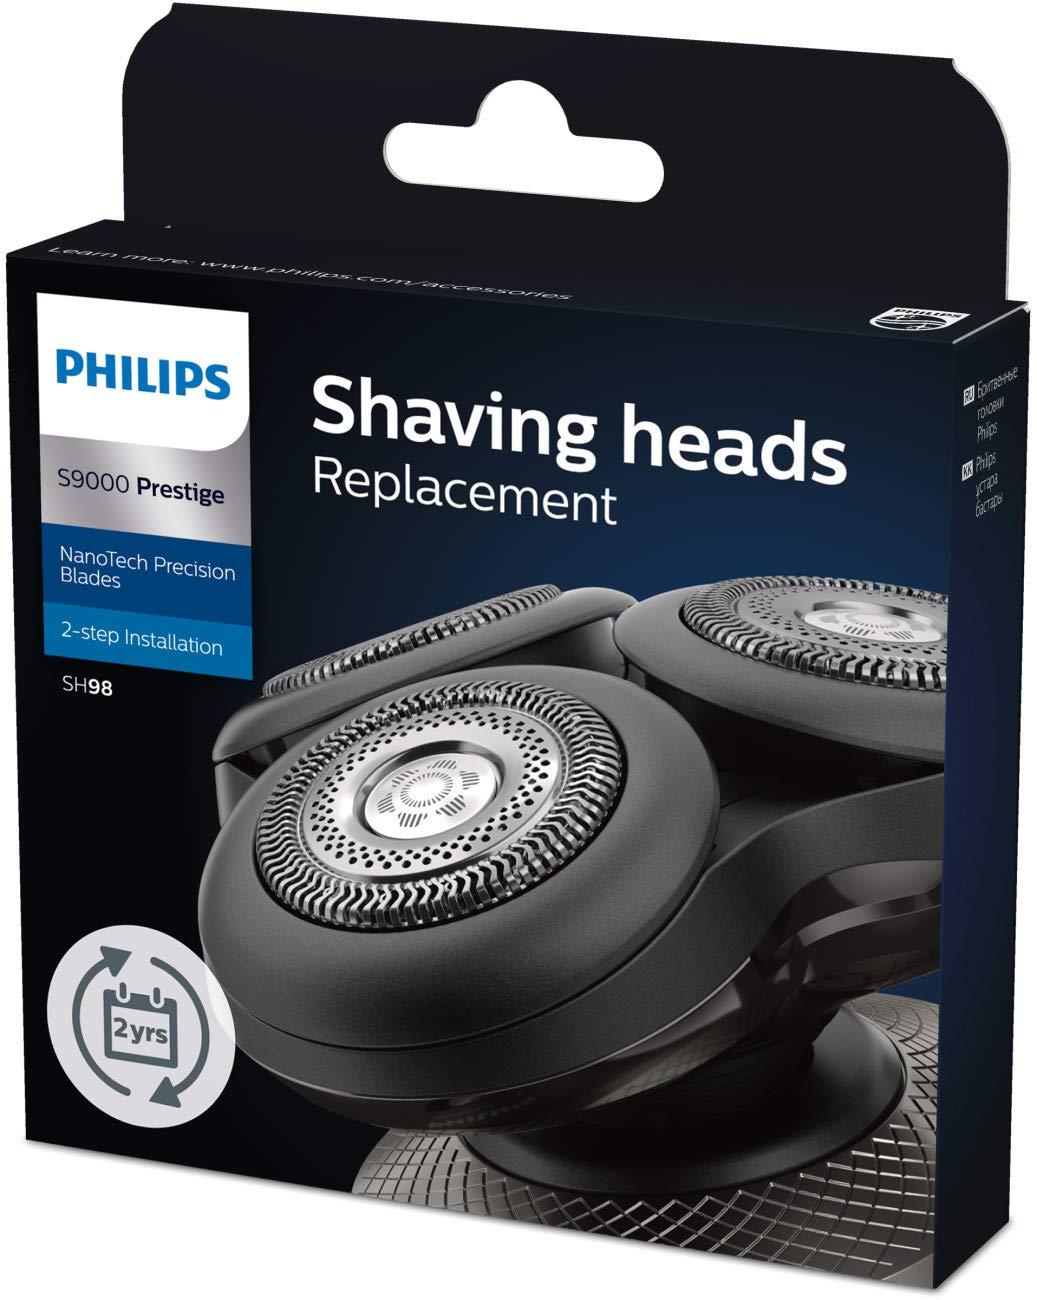 Philips Norelco Shaver 9000 Prestige Shaving head, SH98/72 by Philips Norelco